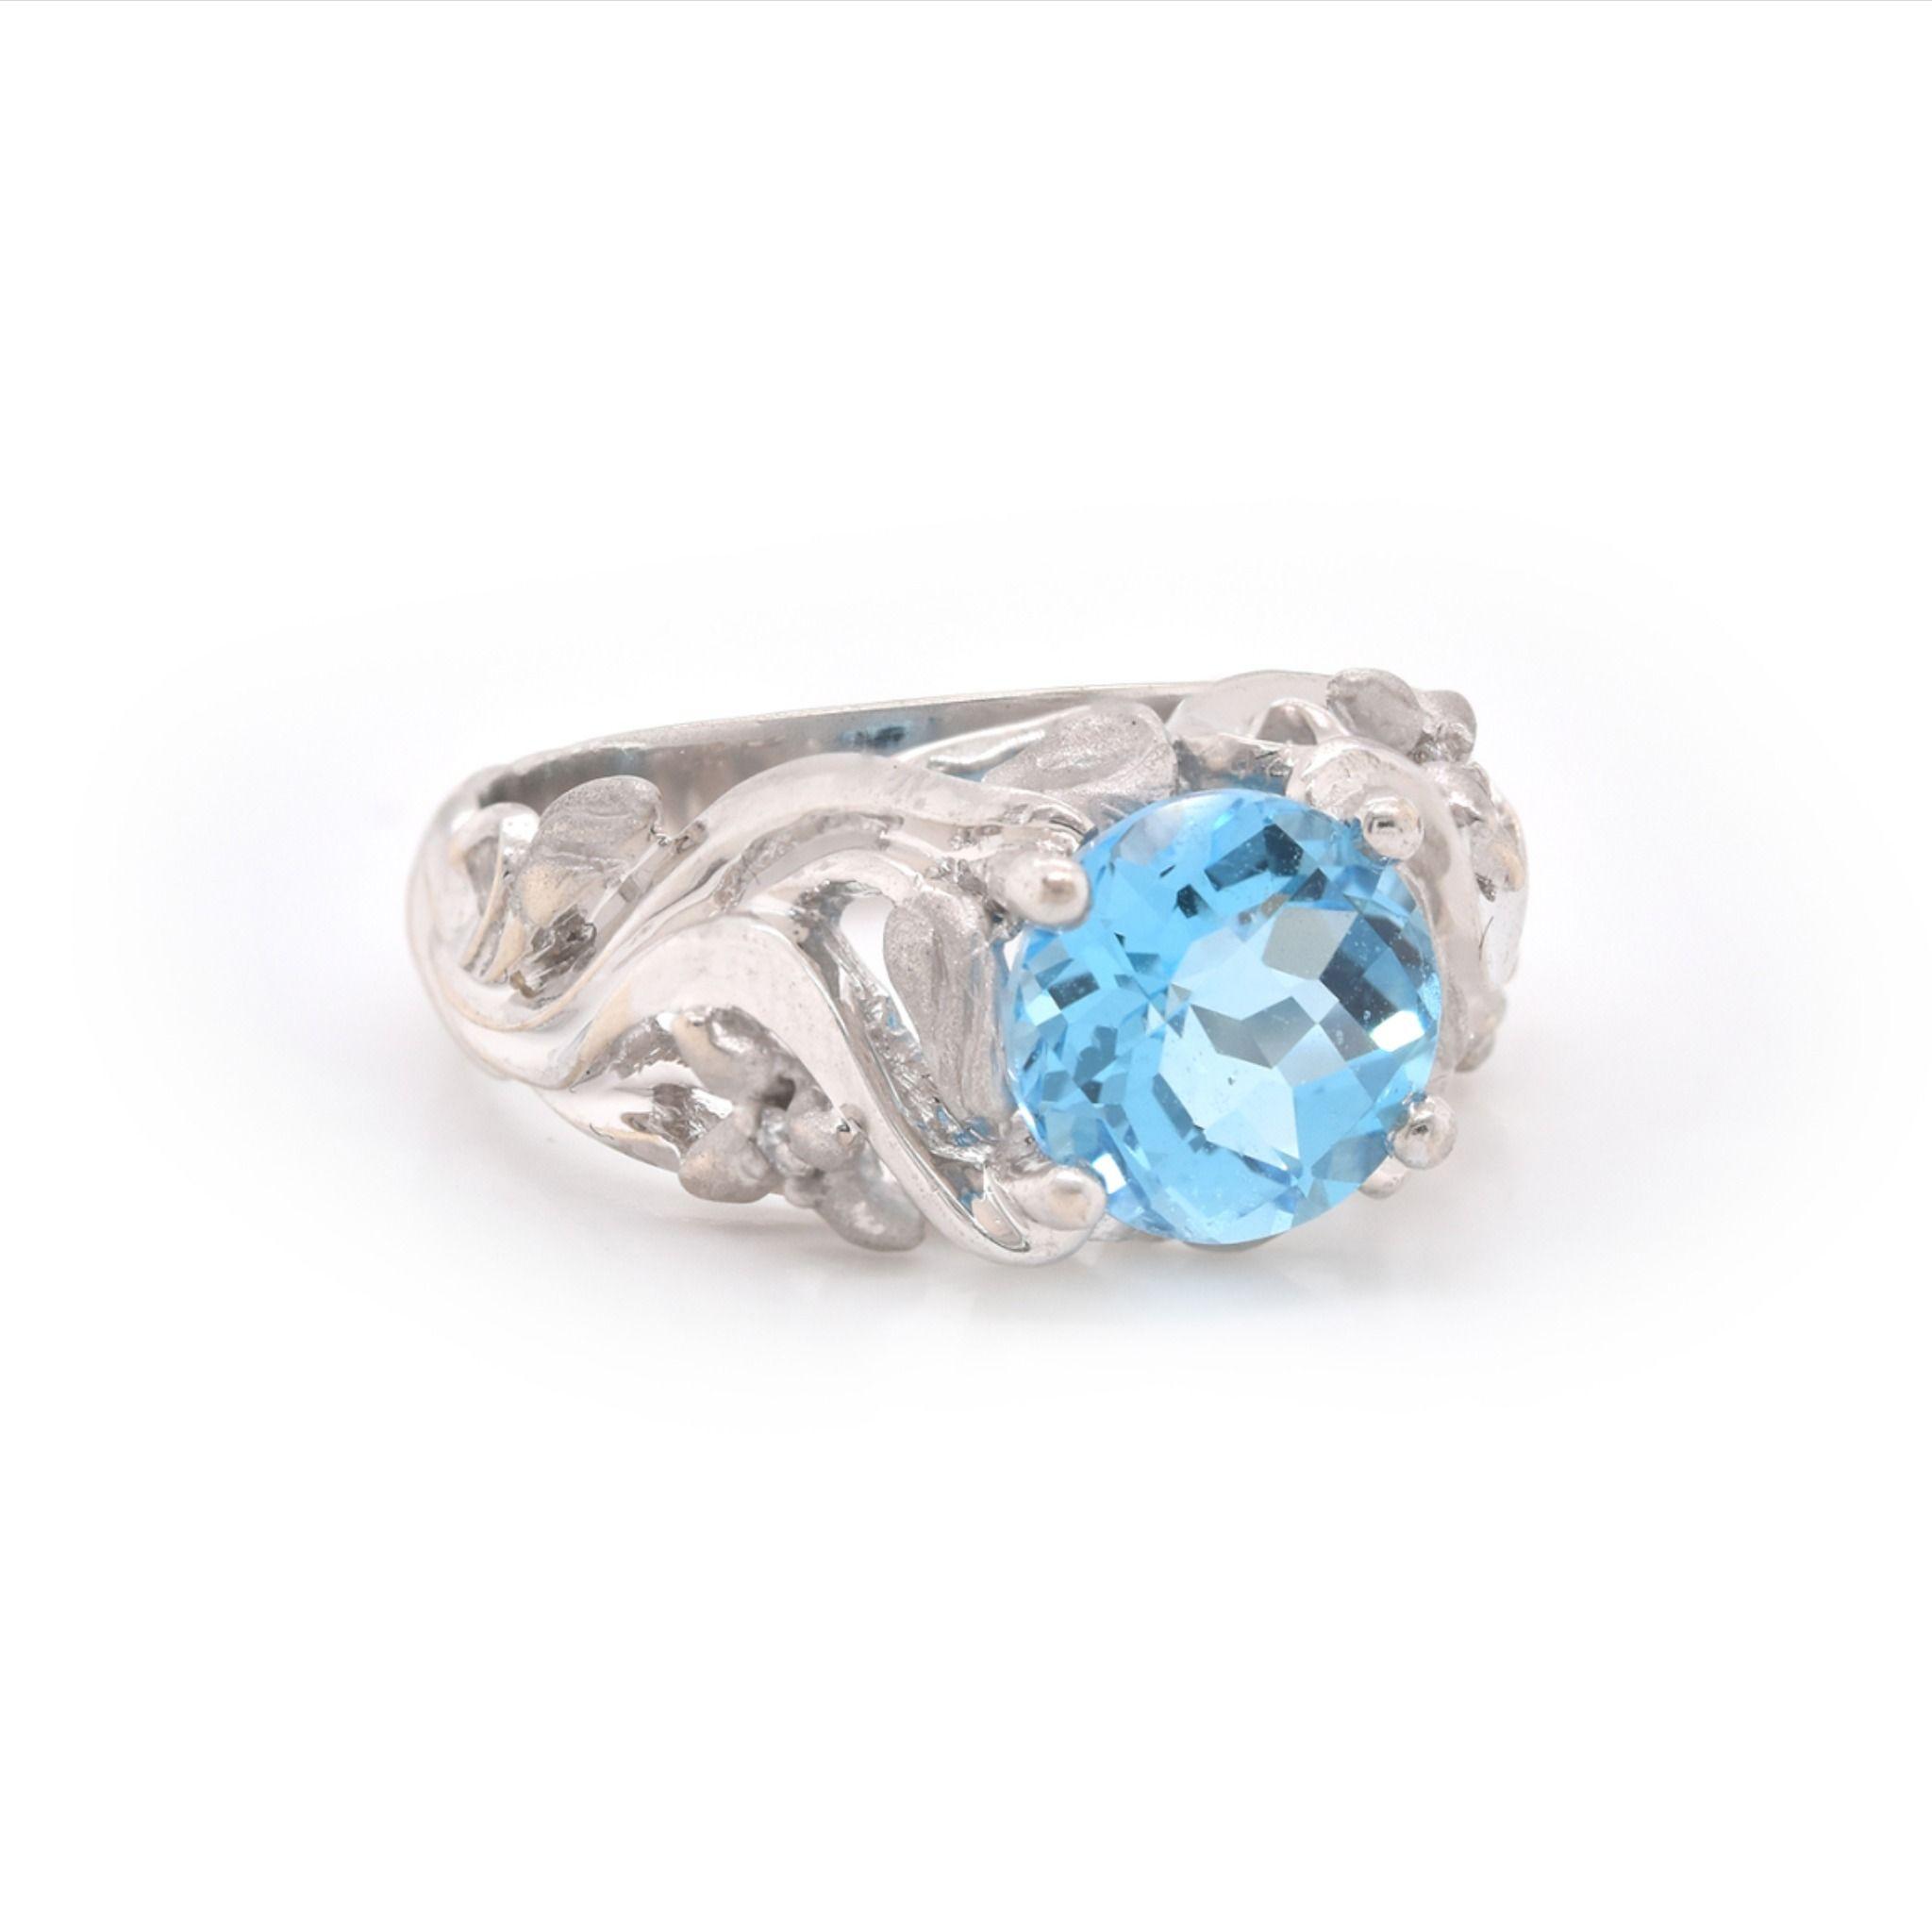 14k White Gold Round Topaz Ring 200 2189 Jewelry From The Estate Watch Jewelry Company Scottsdale Az Topaz Ring White Gold Blue Topaz Ring